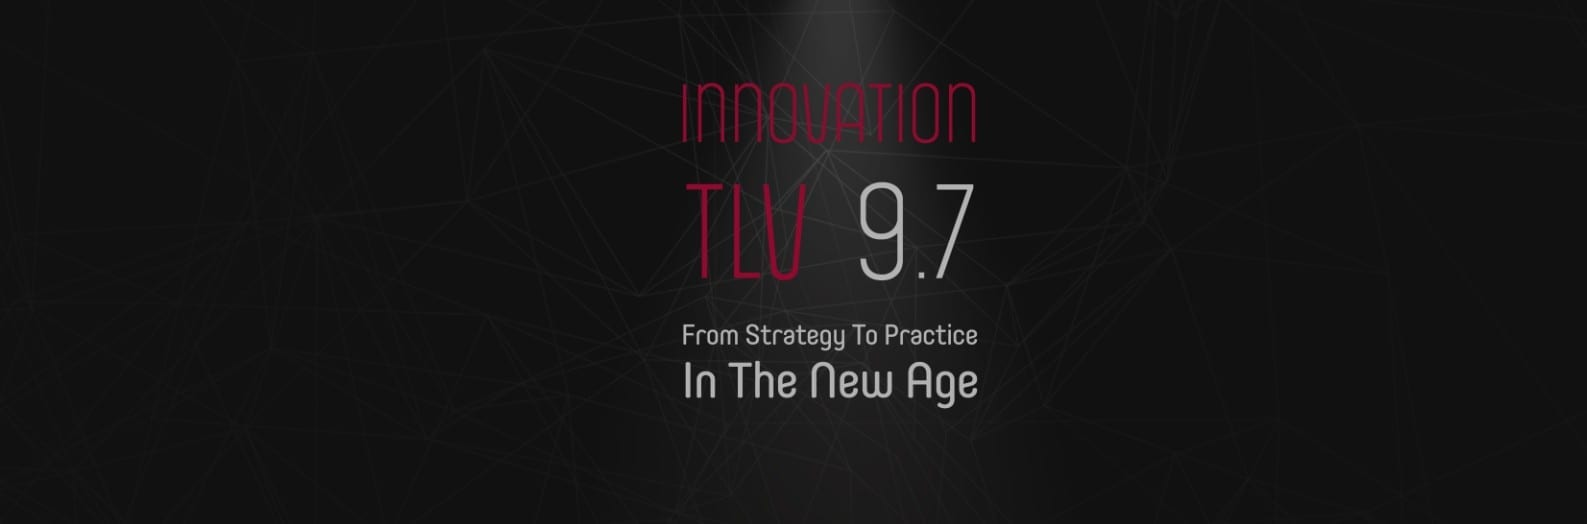 Innovation tlv netcraft